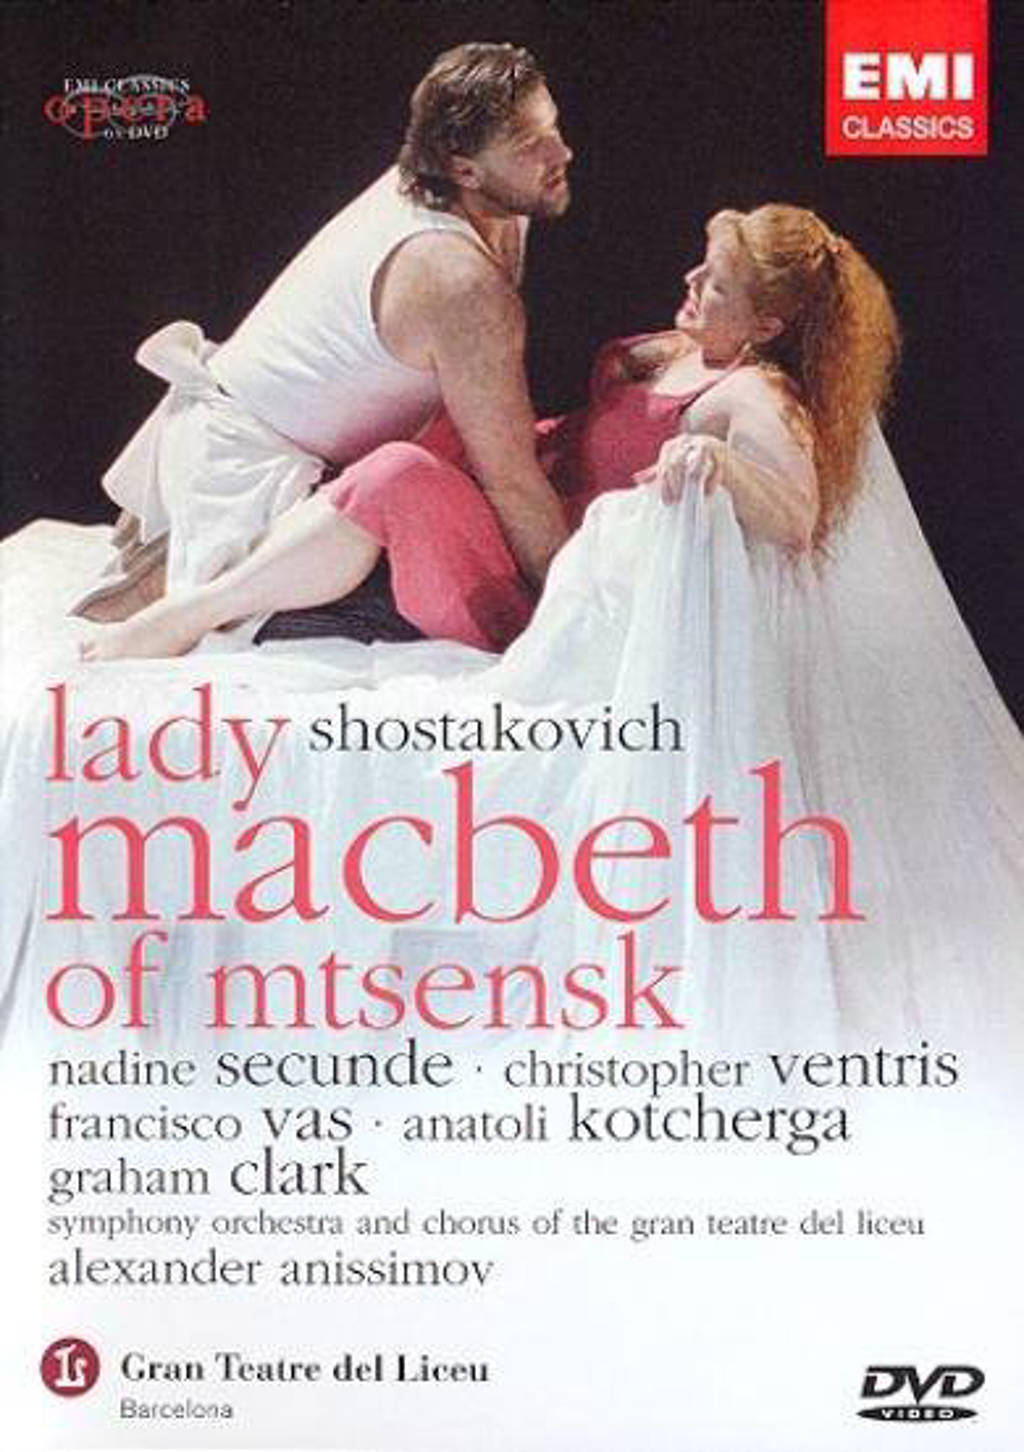 Shostakovich - Lady macbeth of mtsensk (DVD)